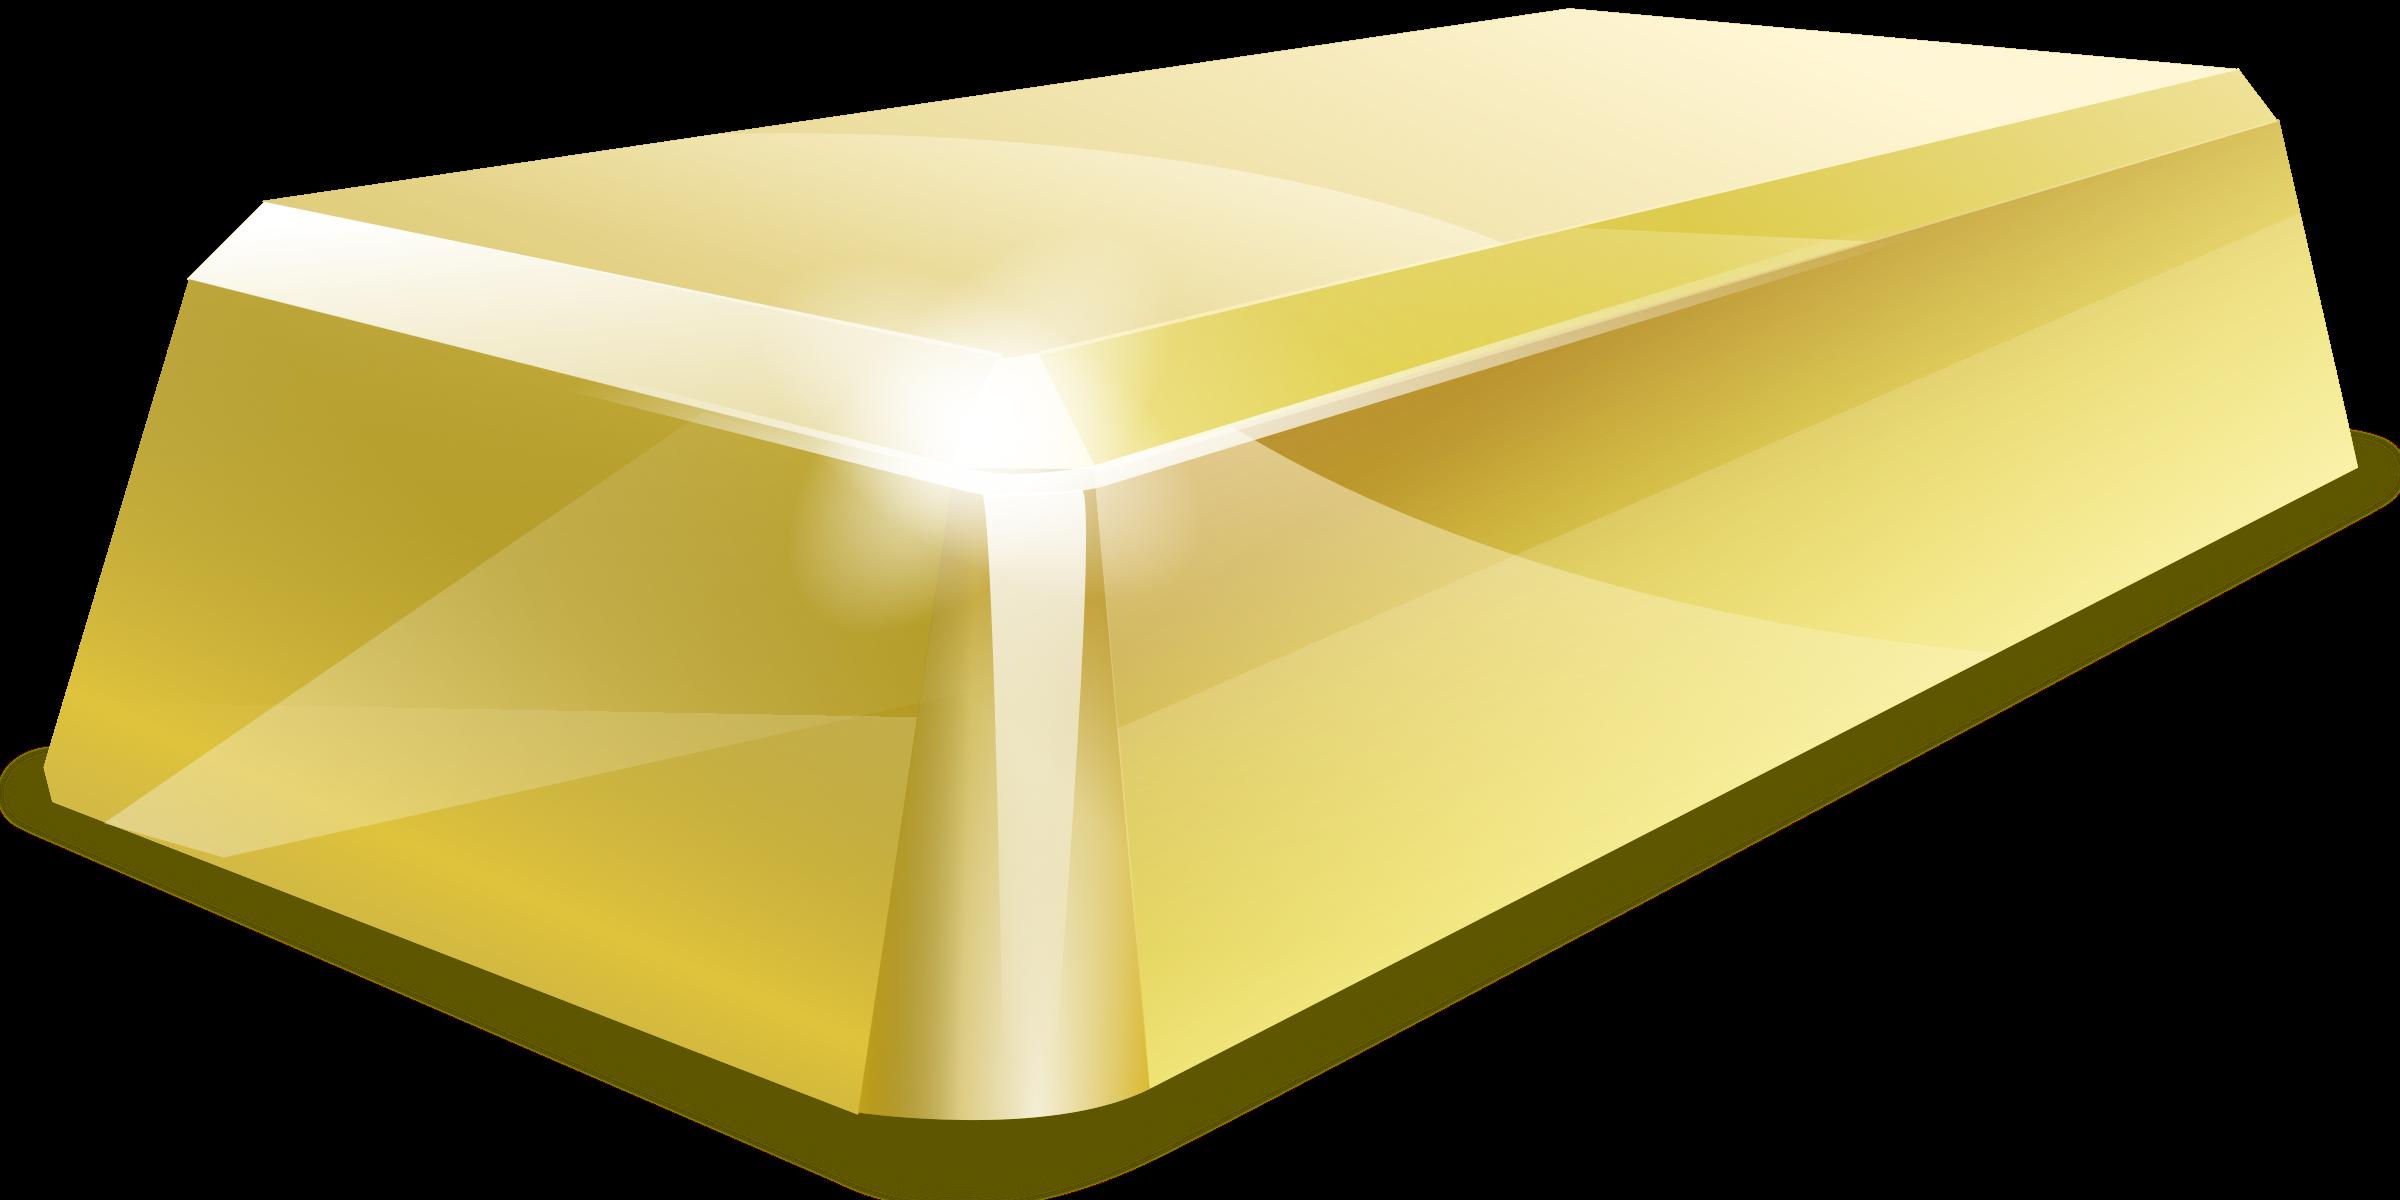 Treasure clipart golden. Gold